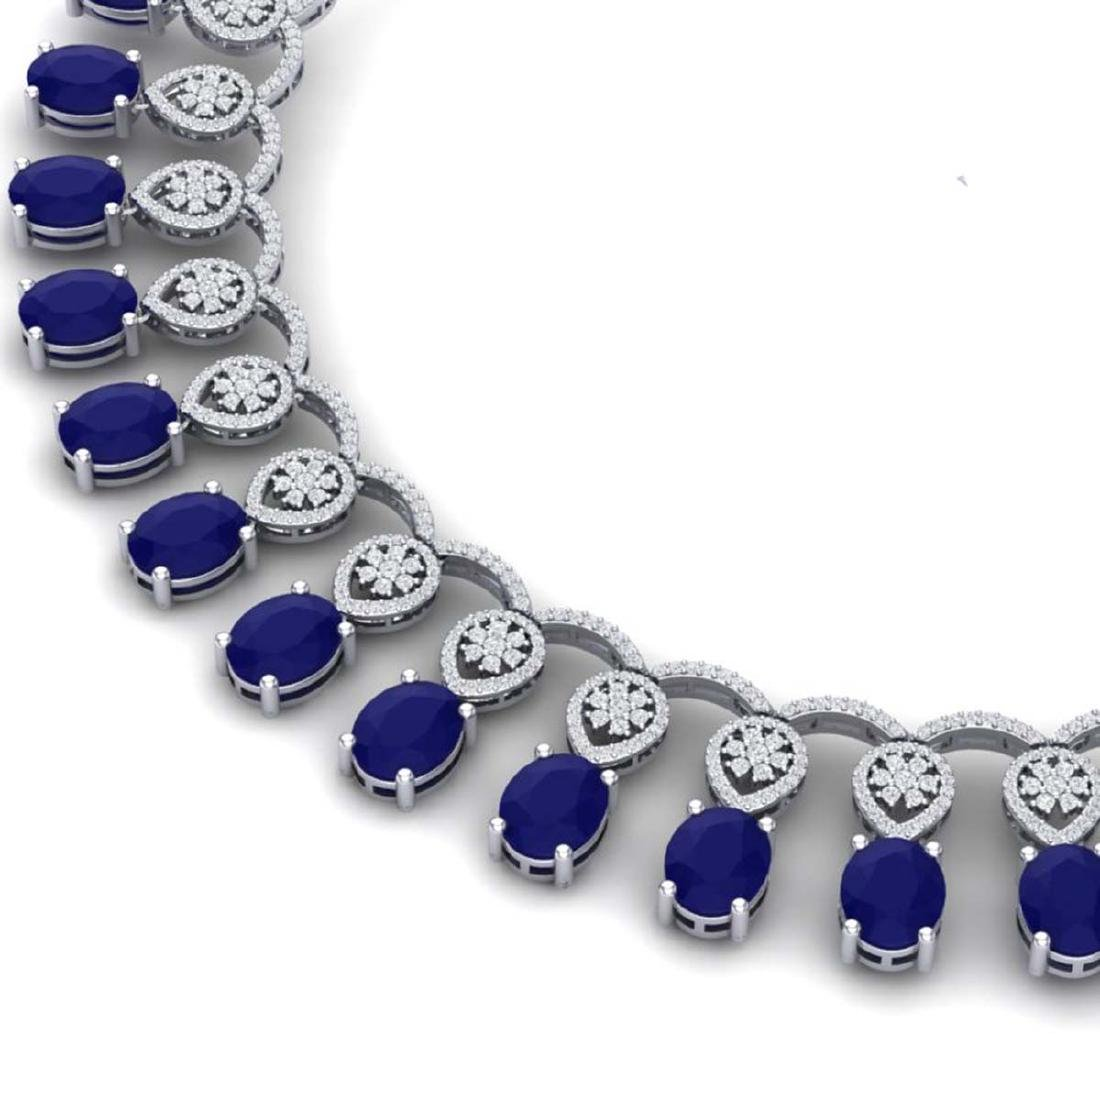 54.05 ctw Sapphire & VS Diamond Necklace 18K White Gold - 2